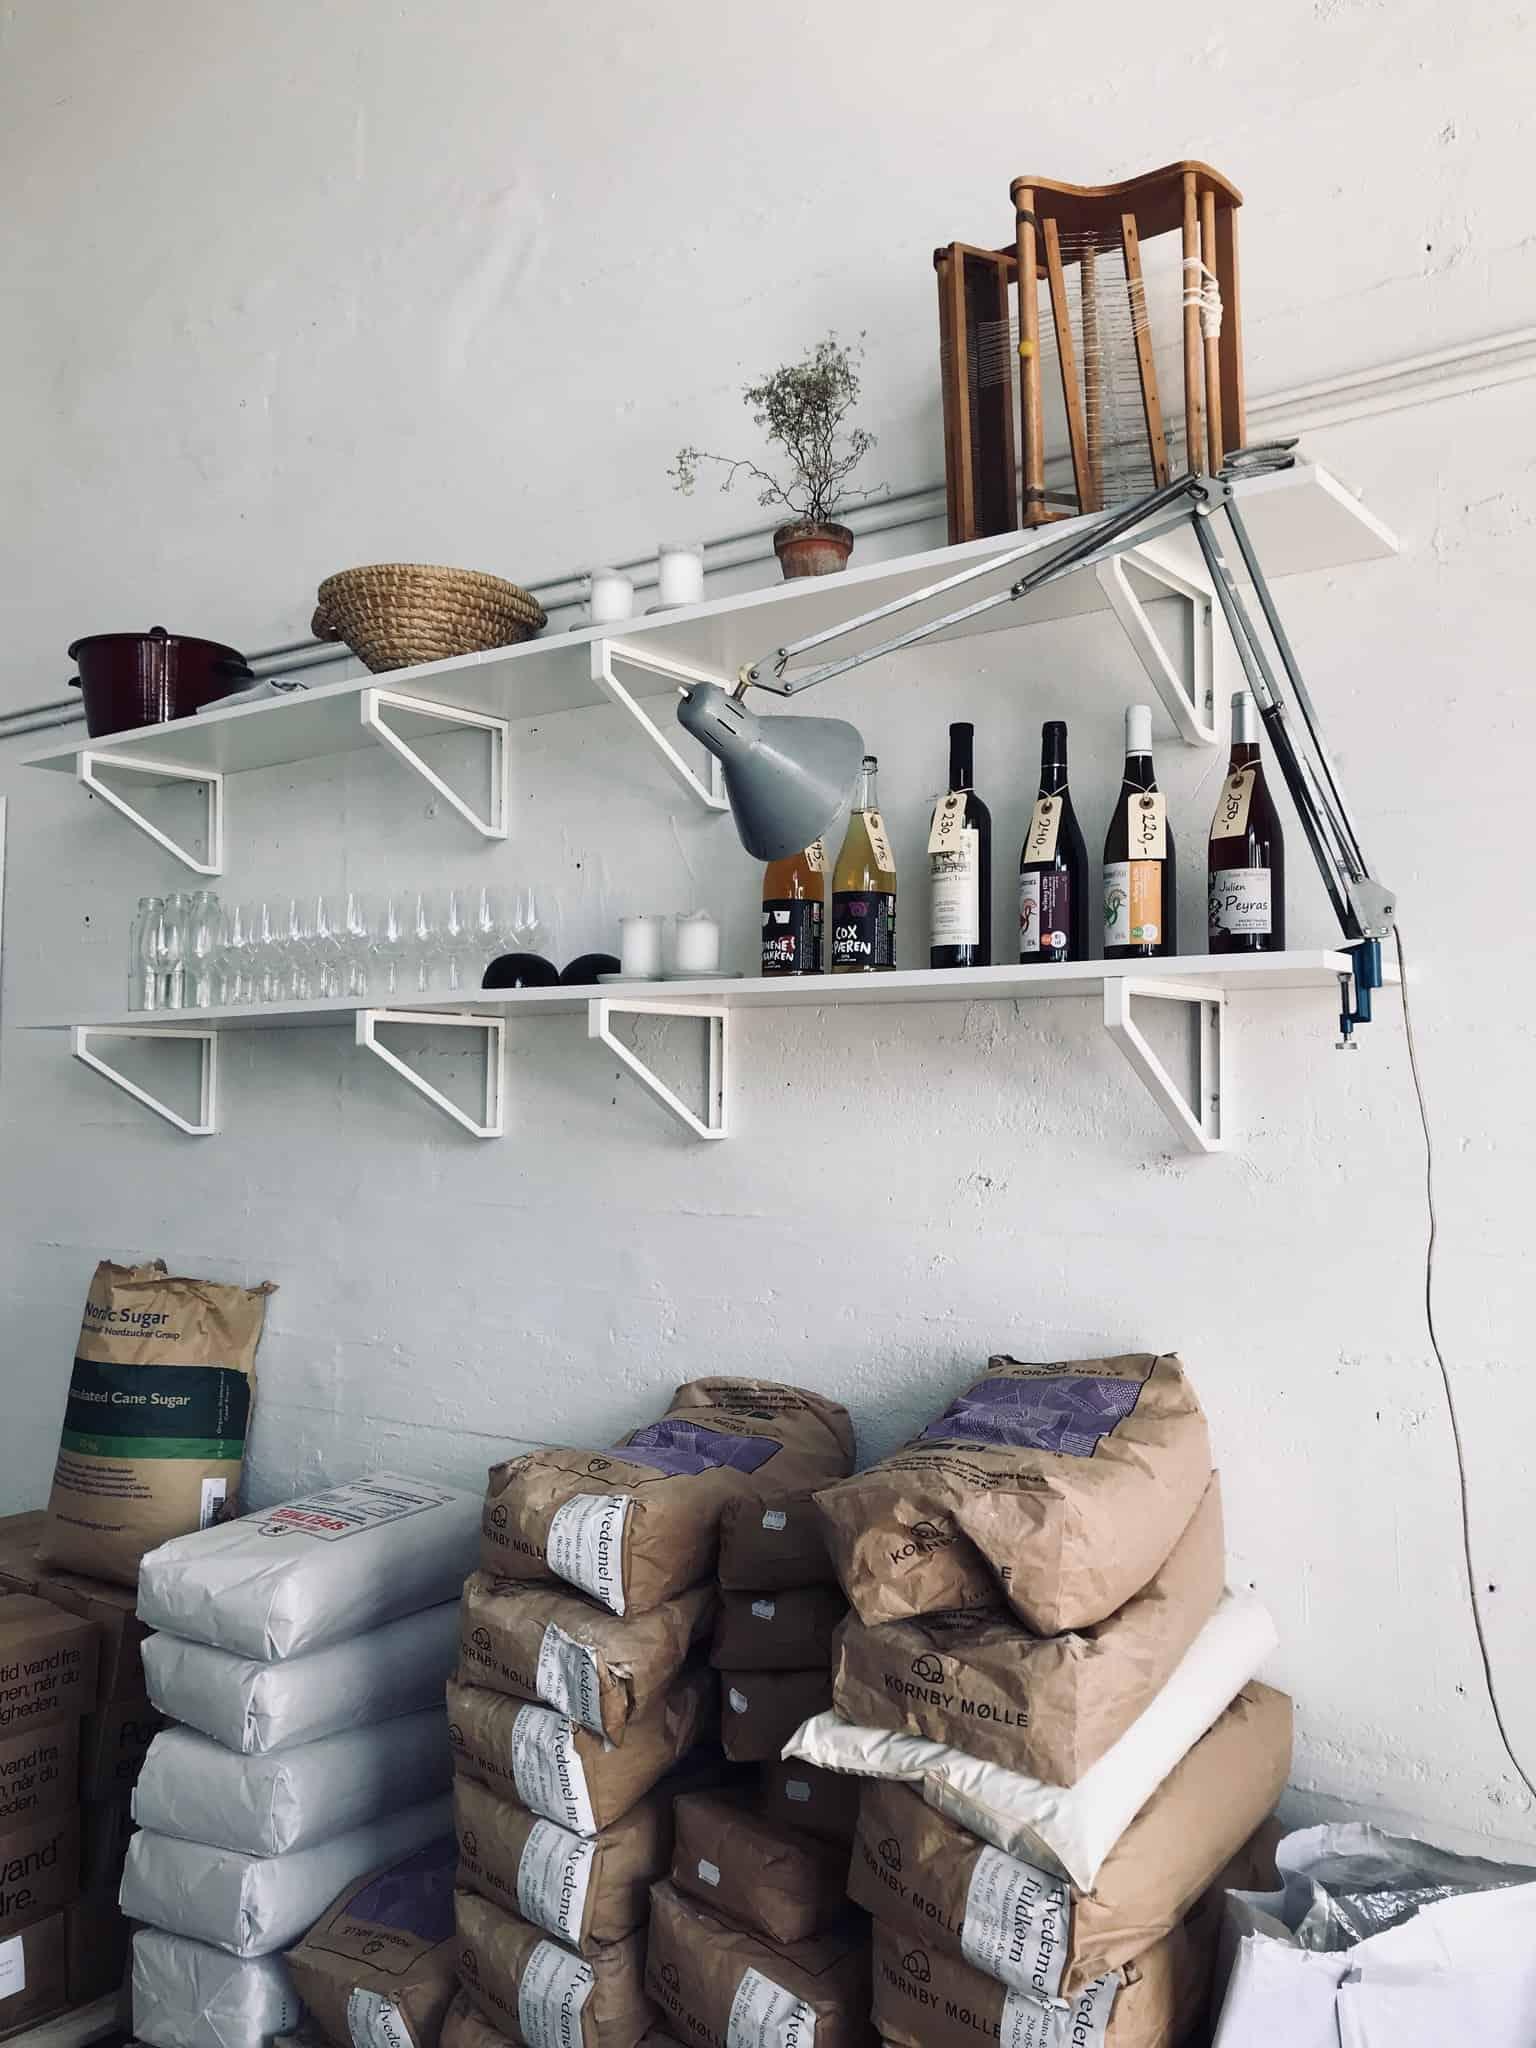 Lille Bakery på Refshaleøen